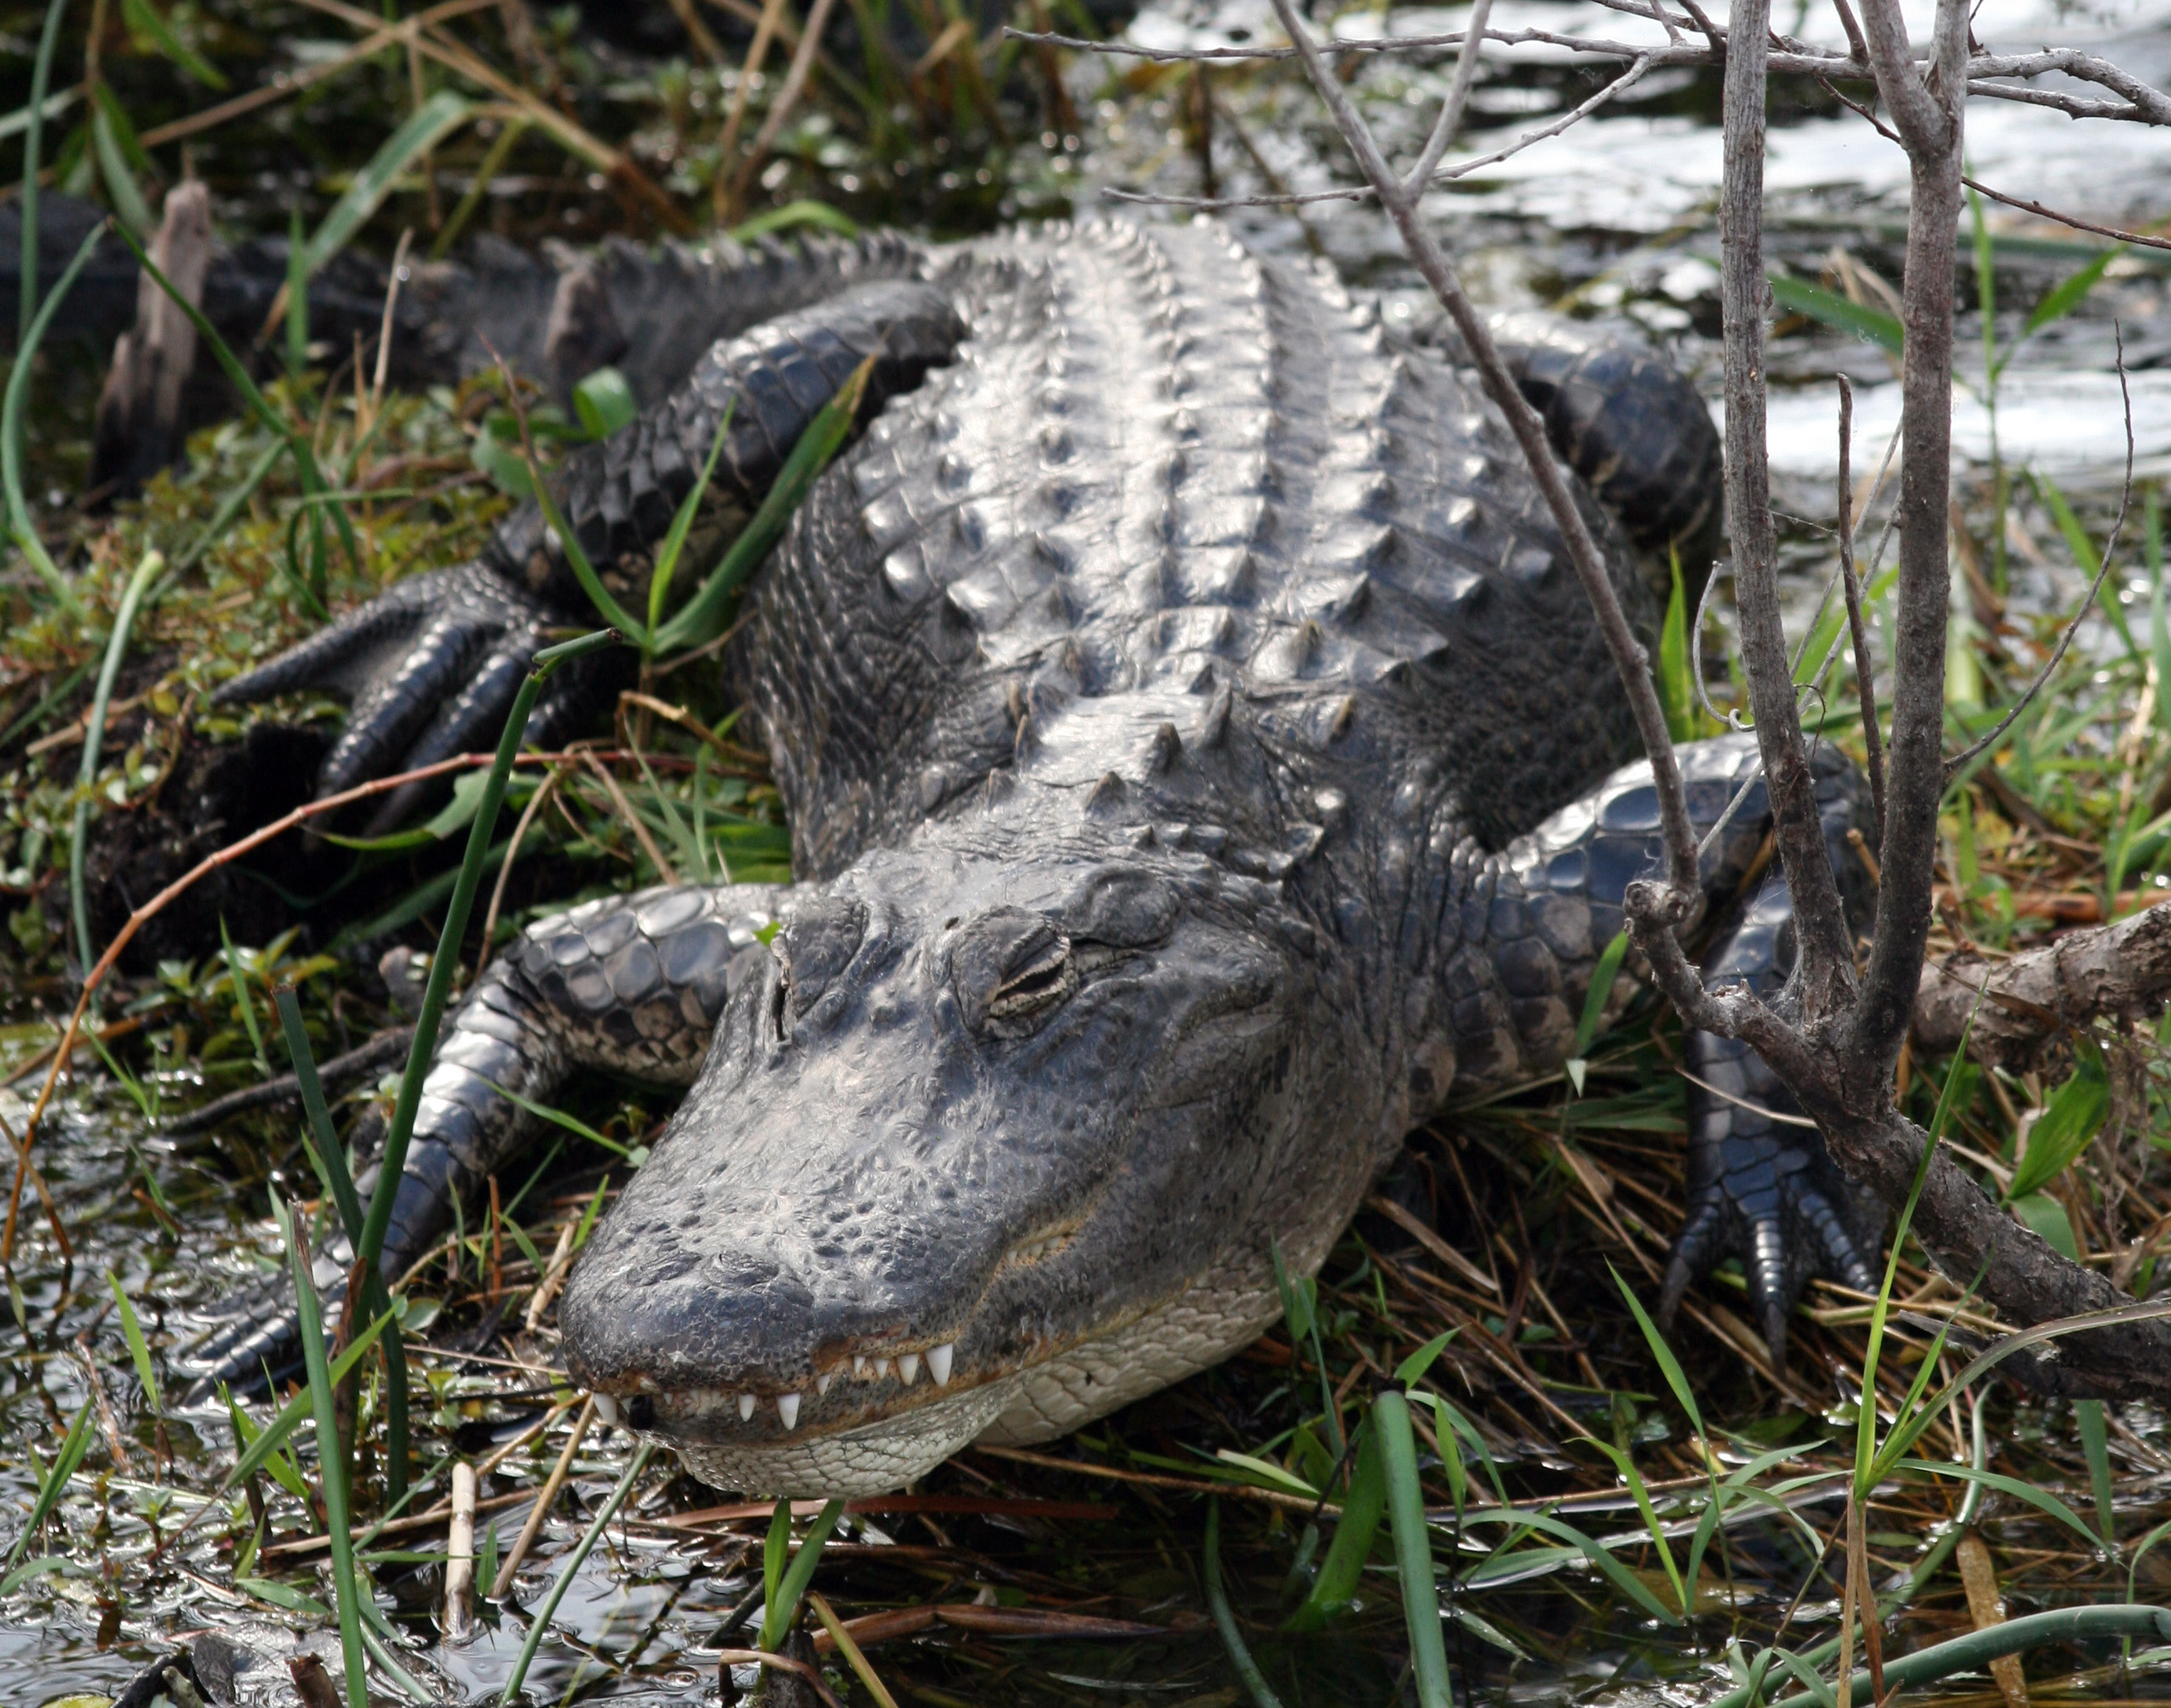 aquarium of the pacific online learning center american alligator